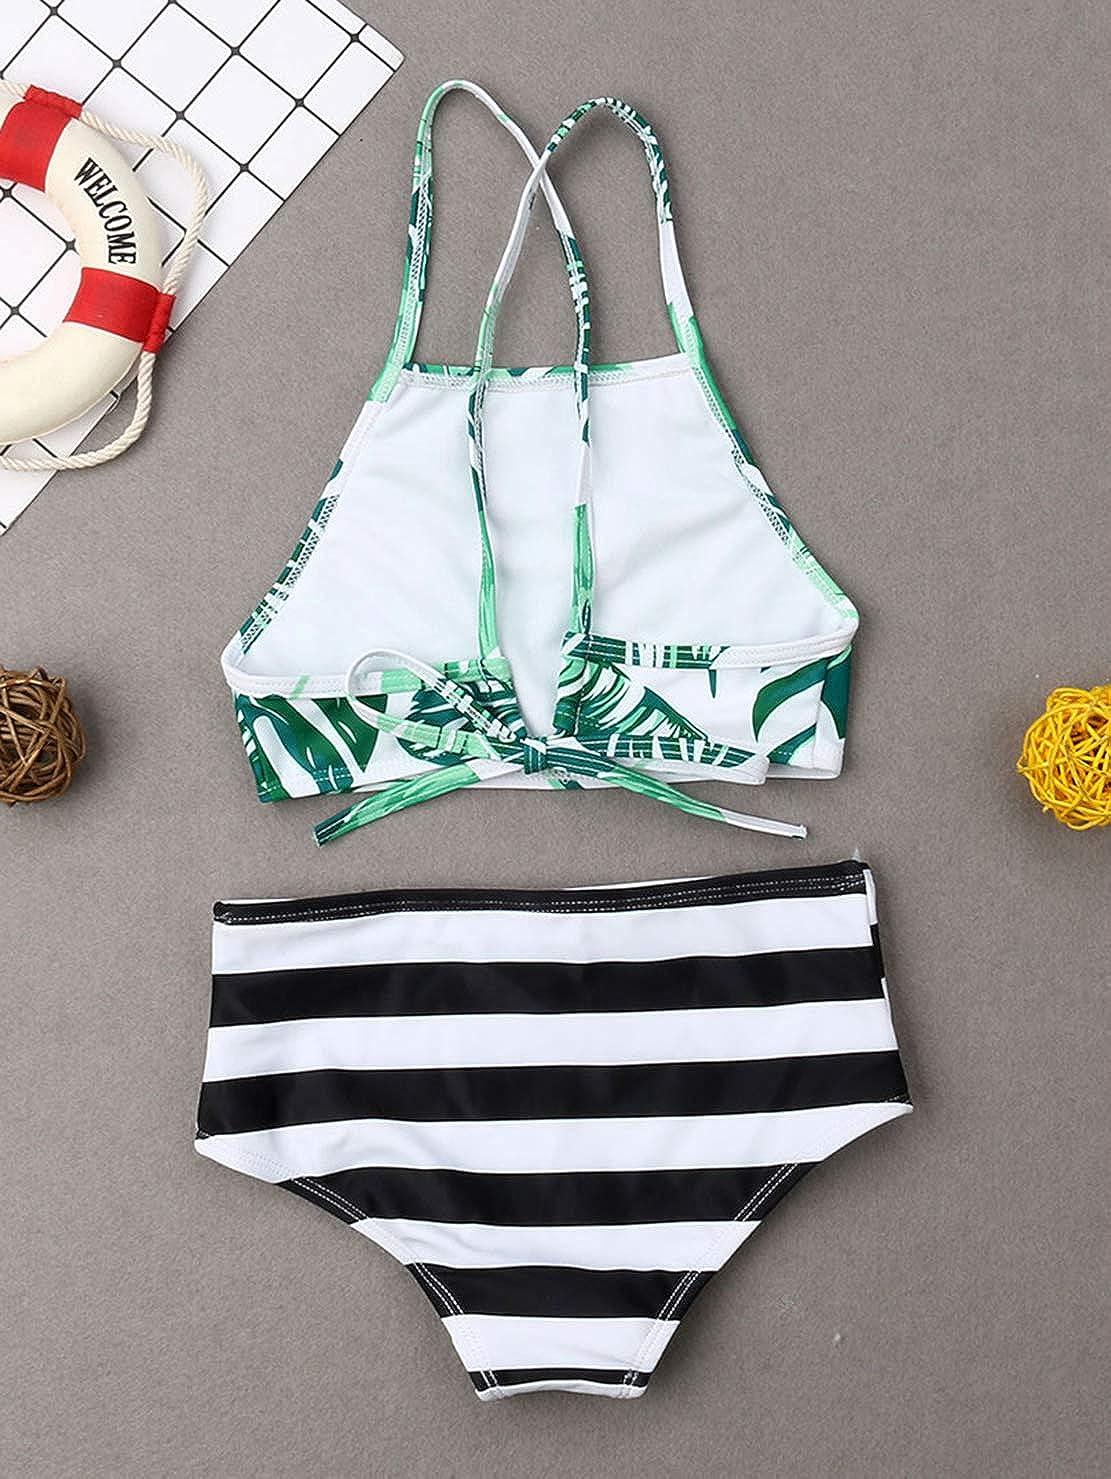 Family Matching Leaf Print Swimsuit Parent-Child Striped Bathing Suit 2 Pieces Bikini Sets 1 Piece Swim Shorts